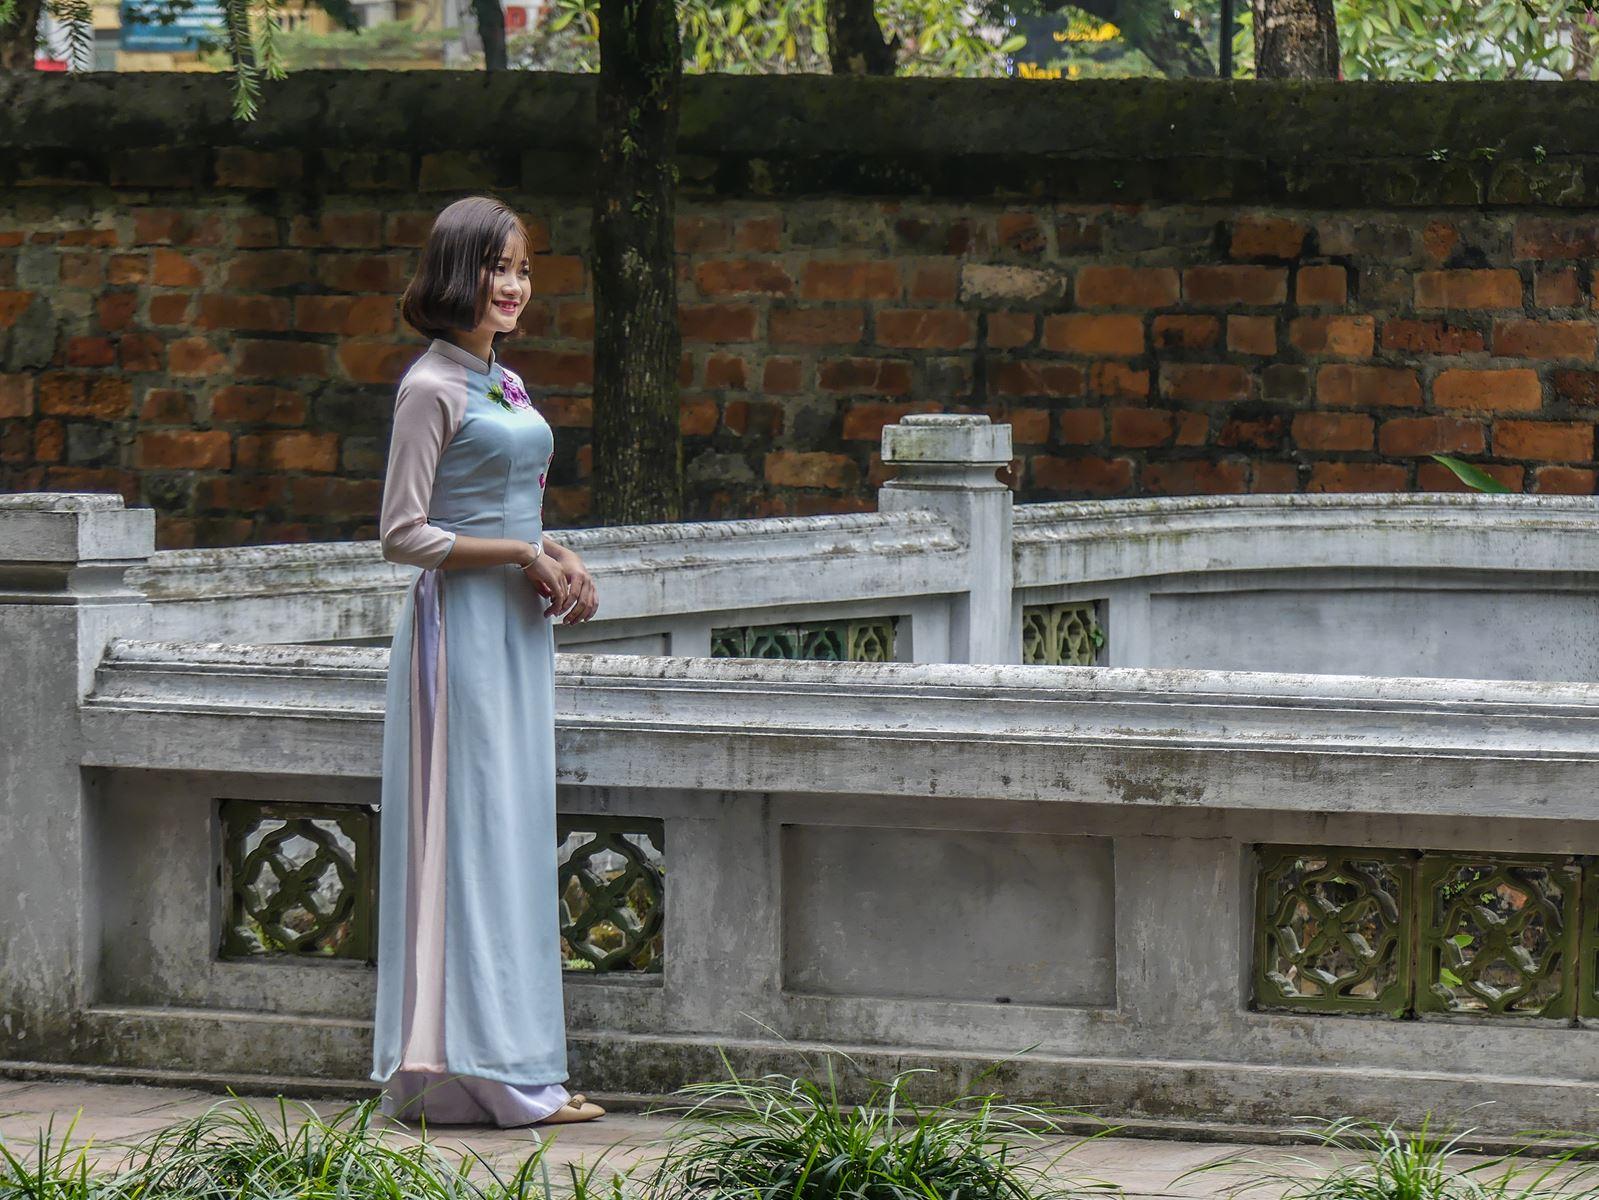 Claironyva Vietnam Hanoi Temple de la littérature